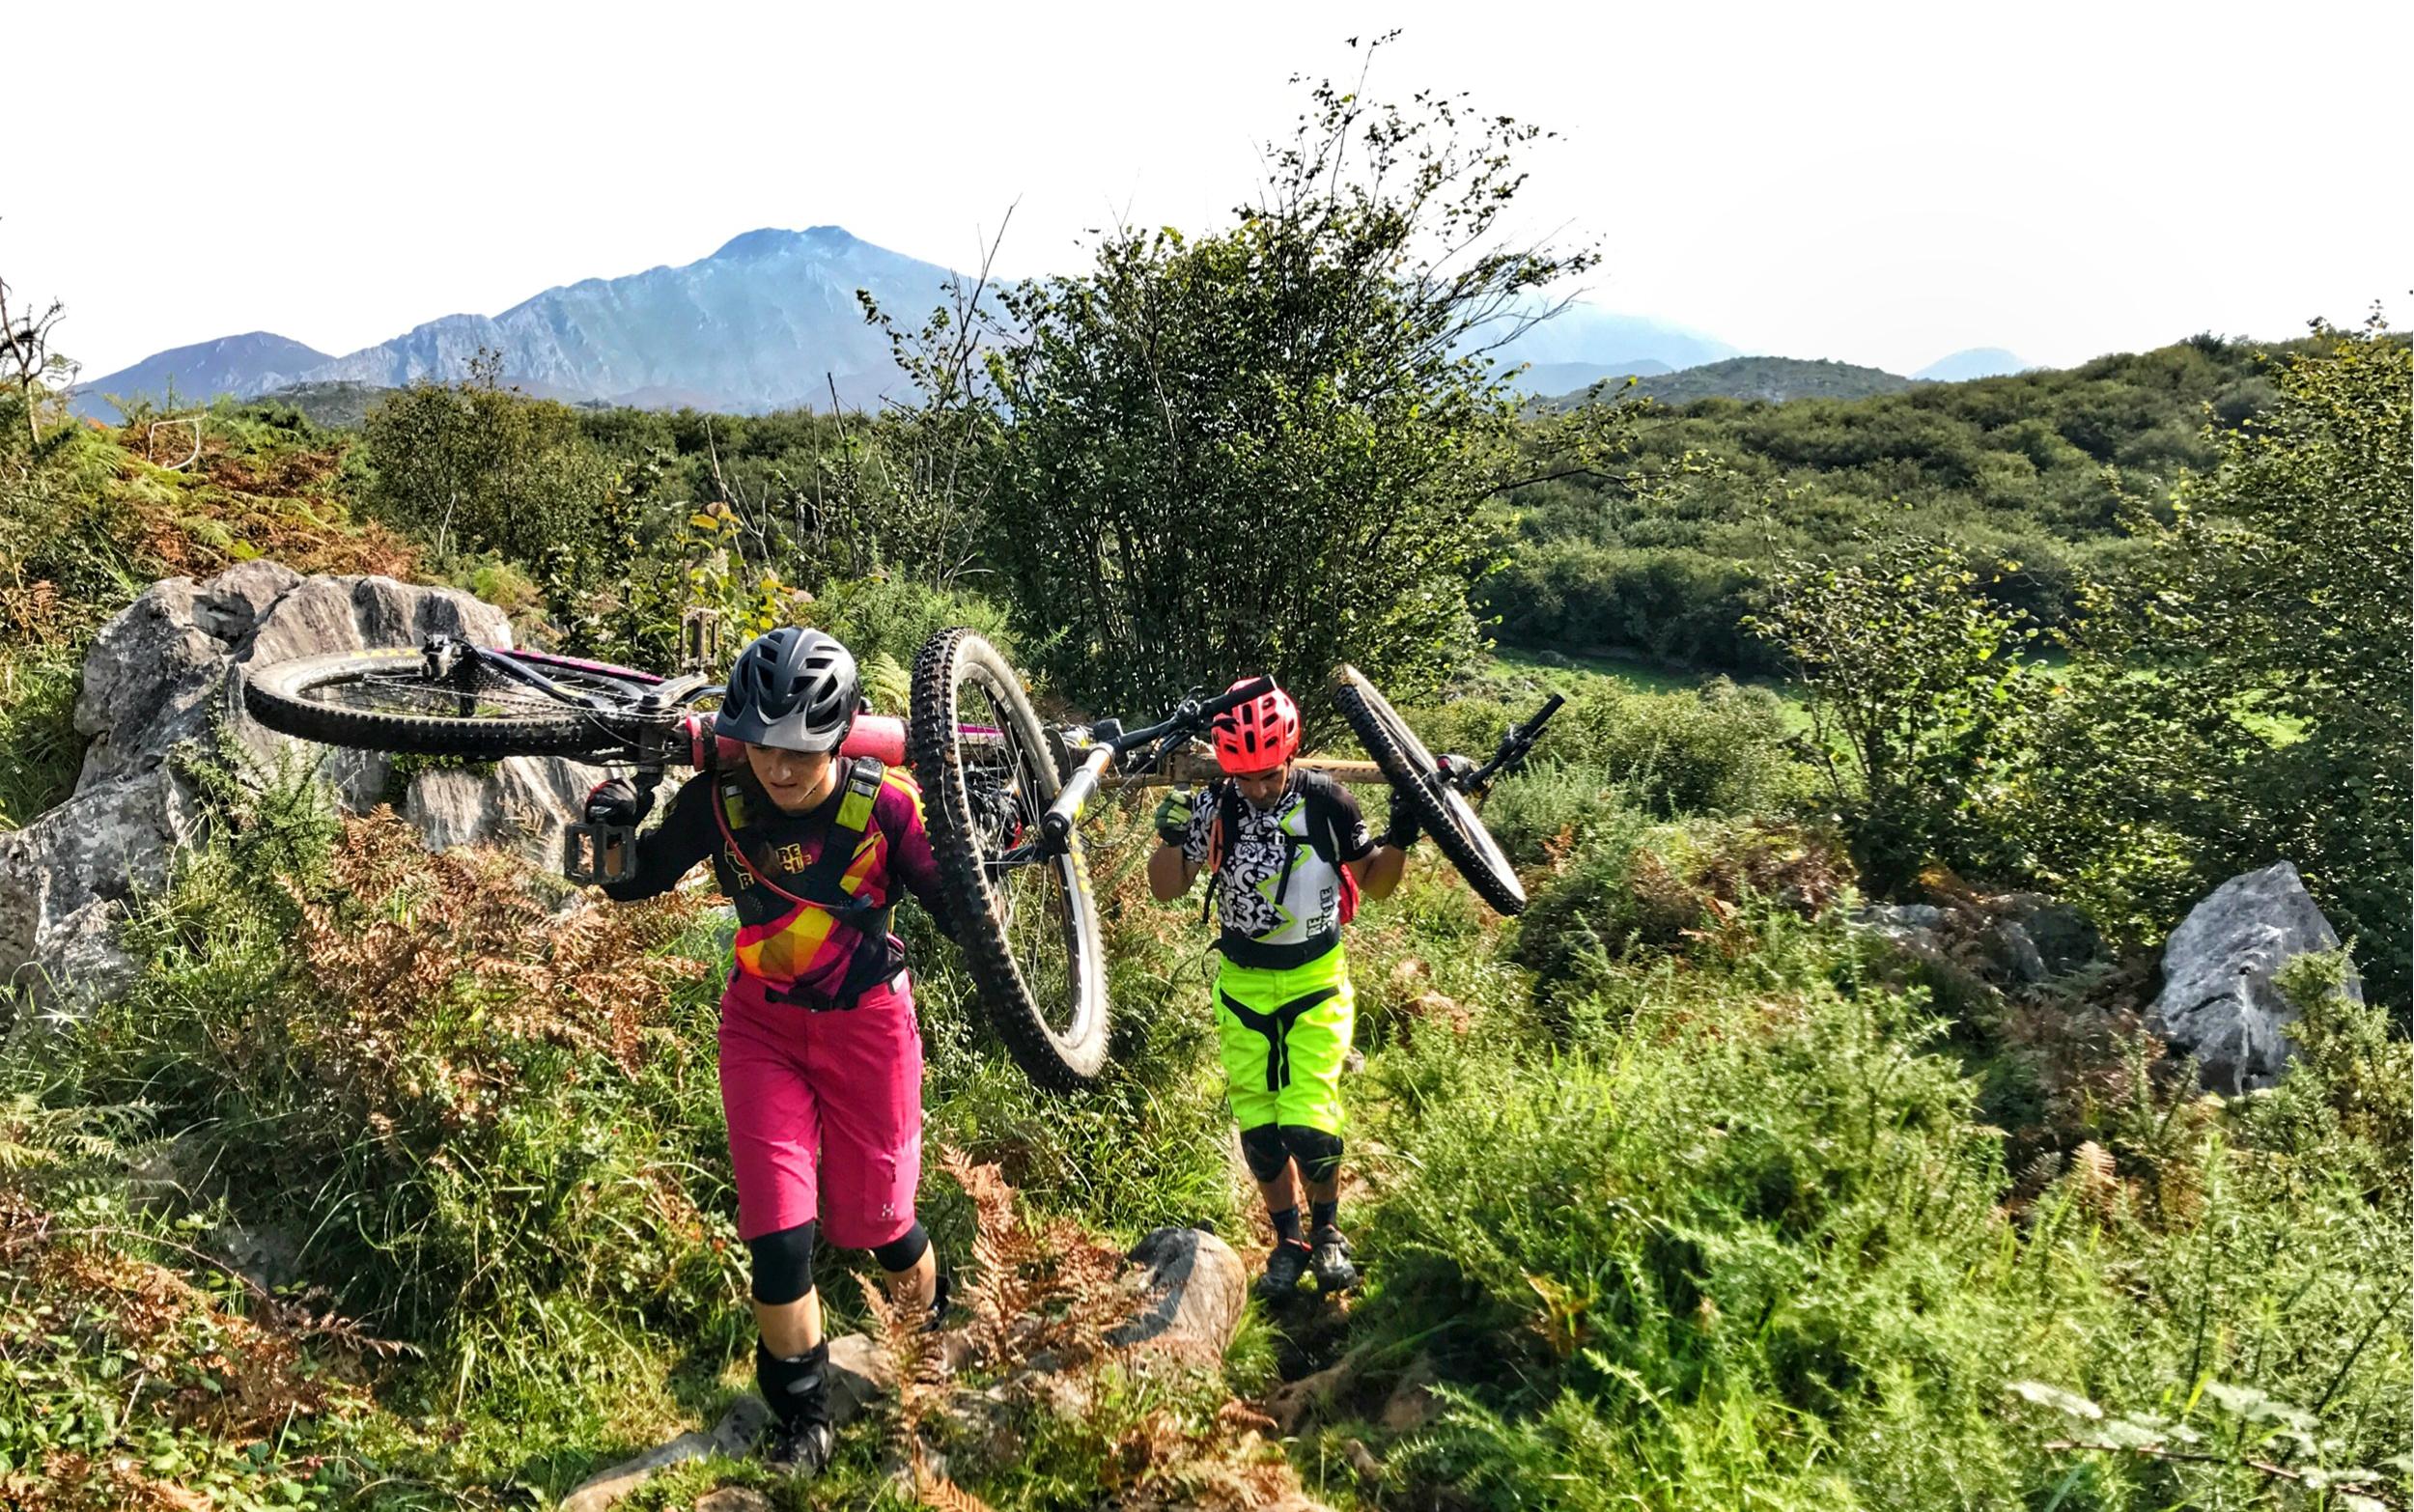 Laura Celdran Picos de Europe mountain bike